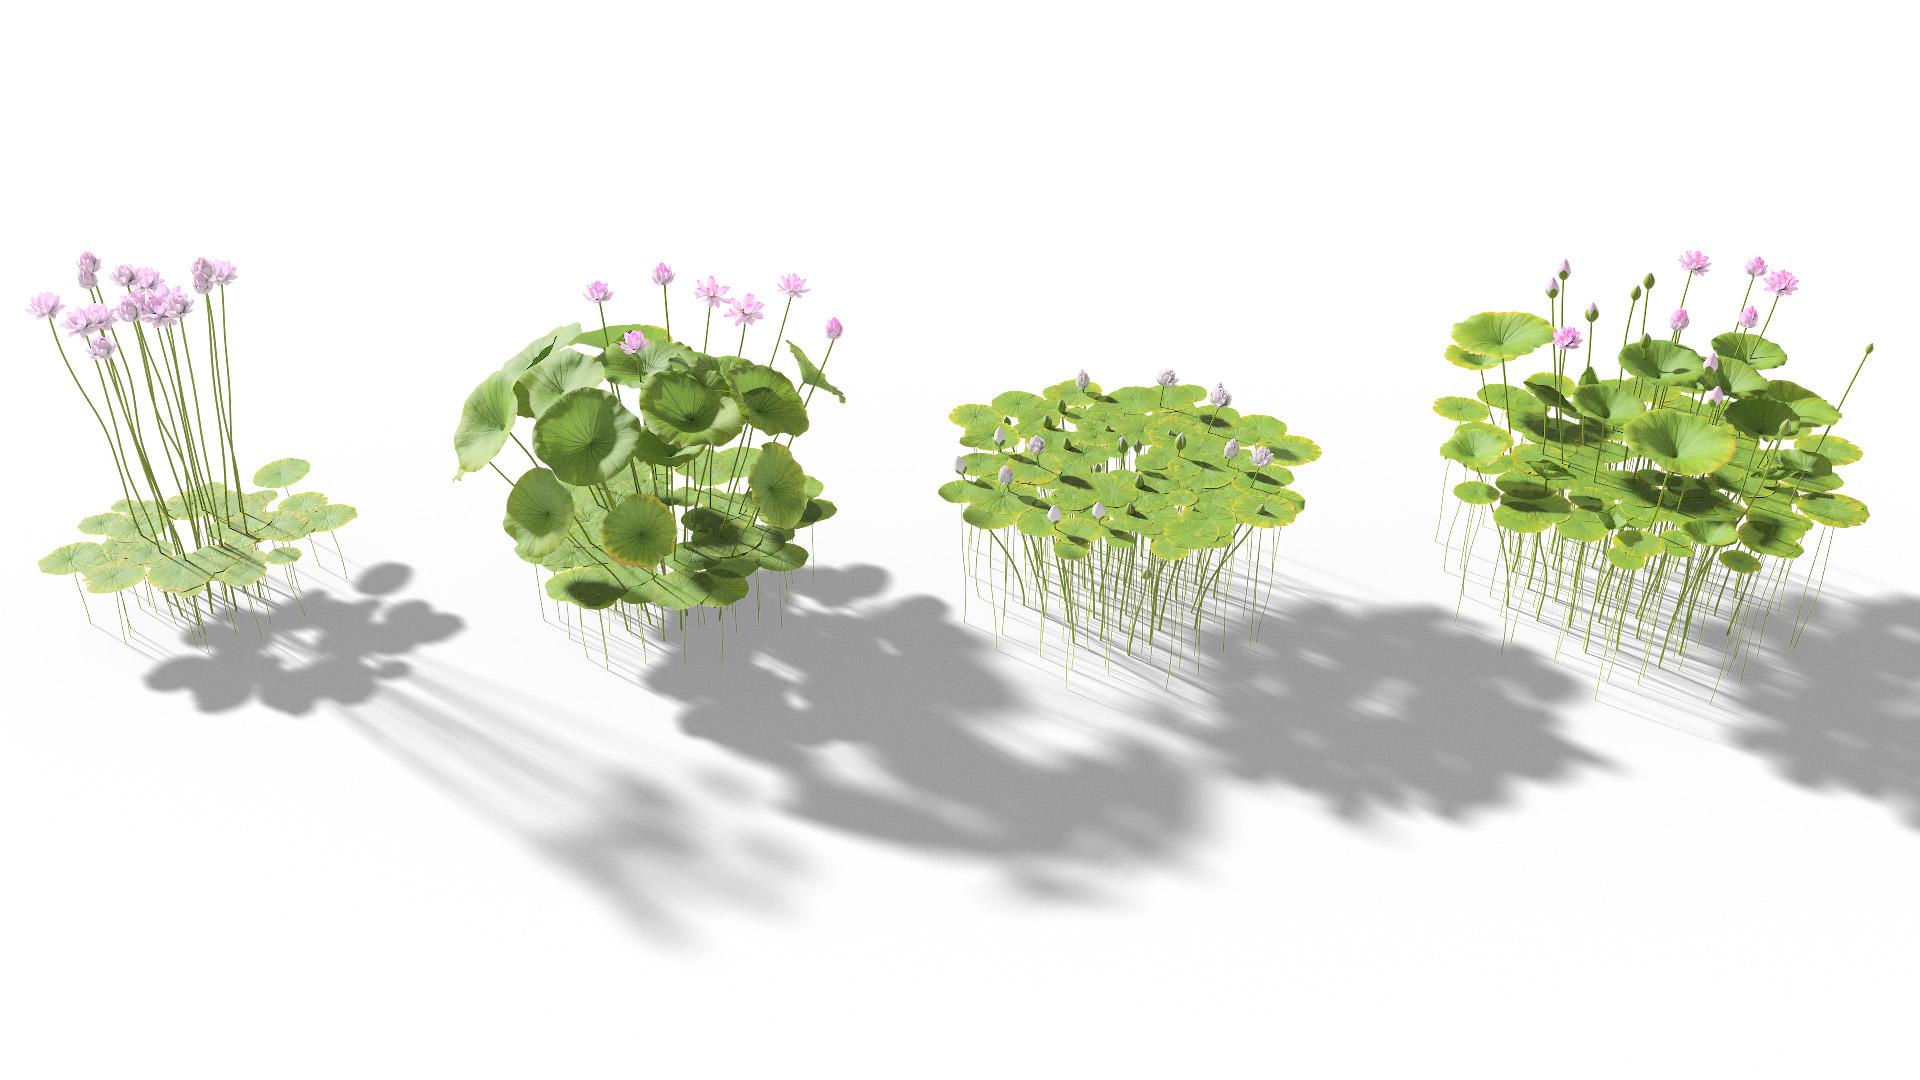 3D model of the Sacred lotus Nelumbo nucifera published parameters